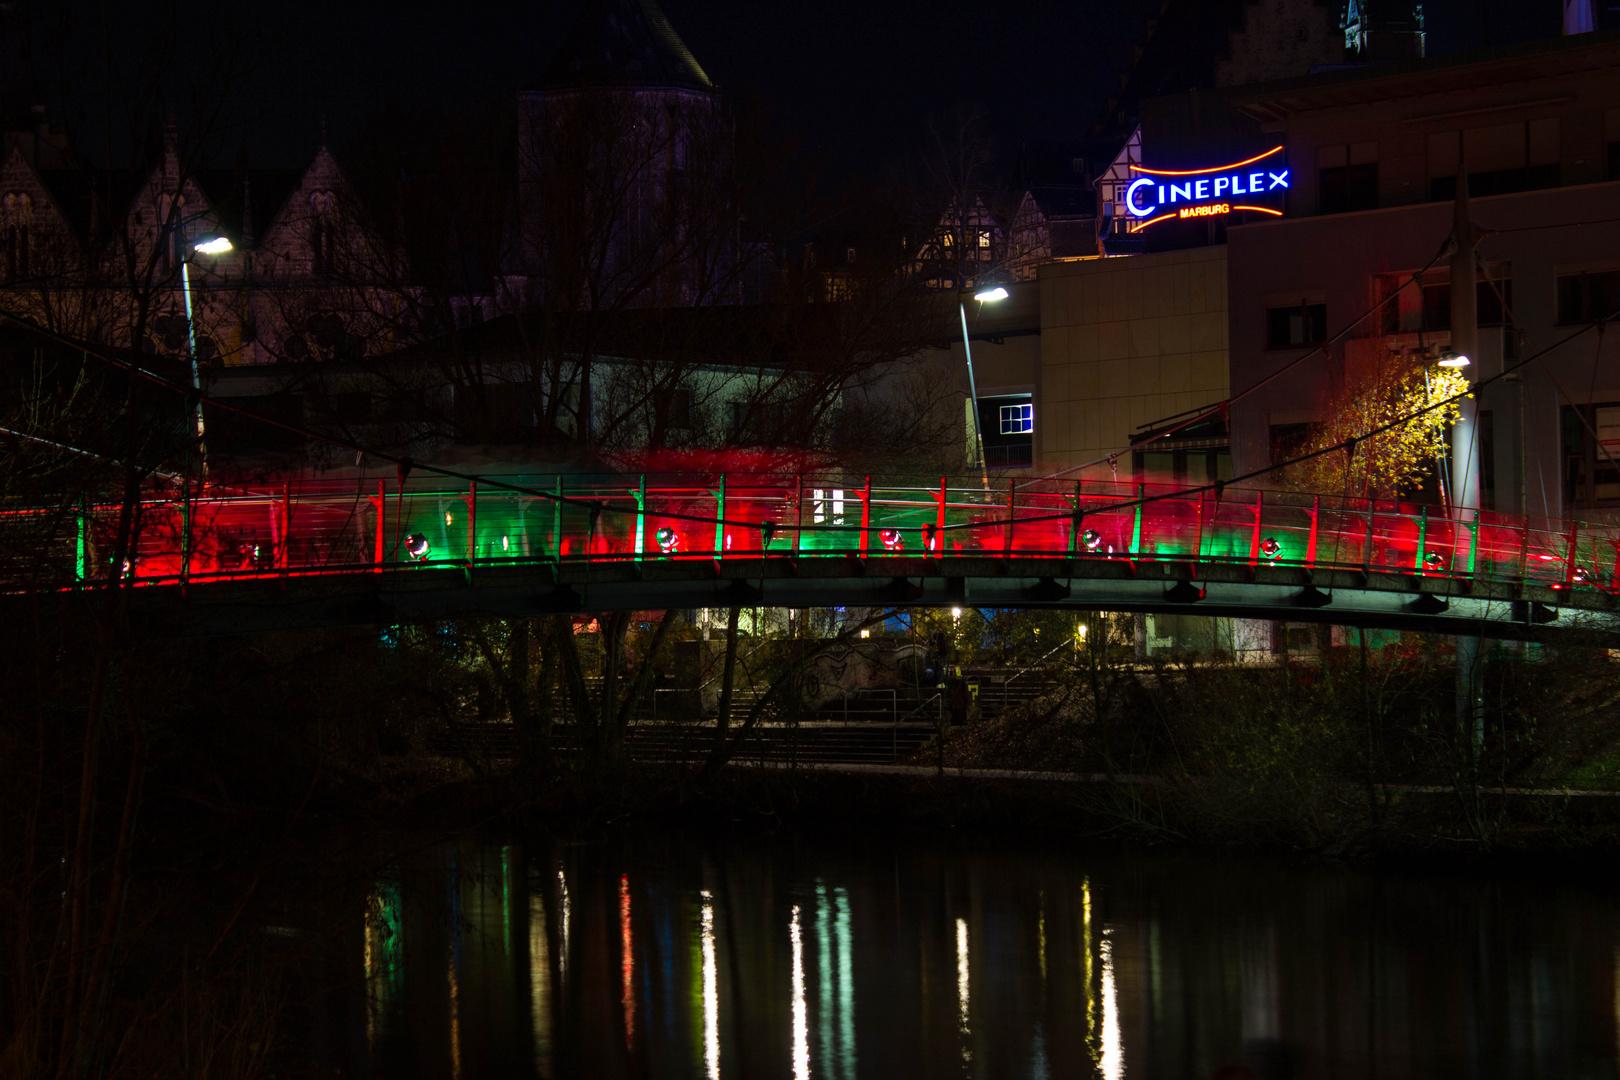 bridge to cineplex.